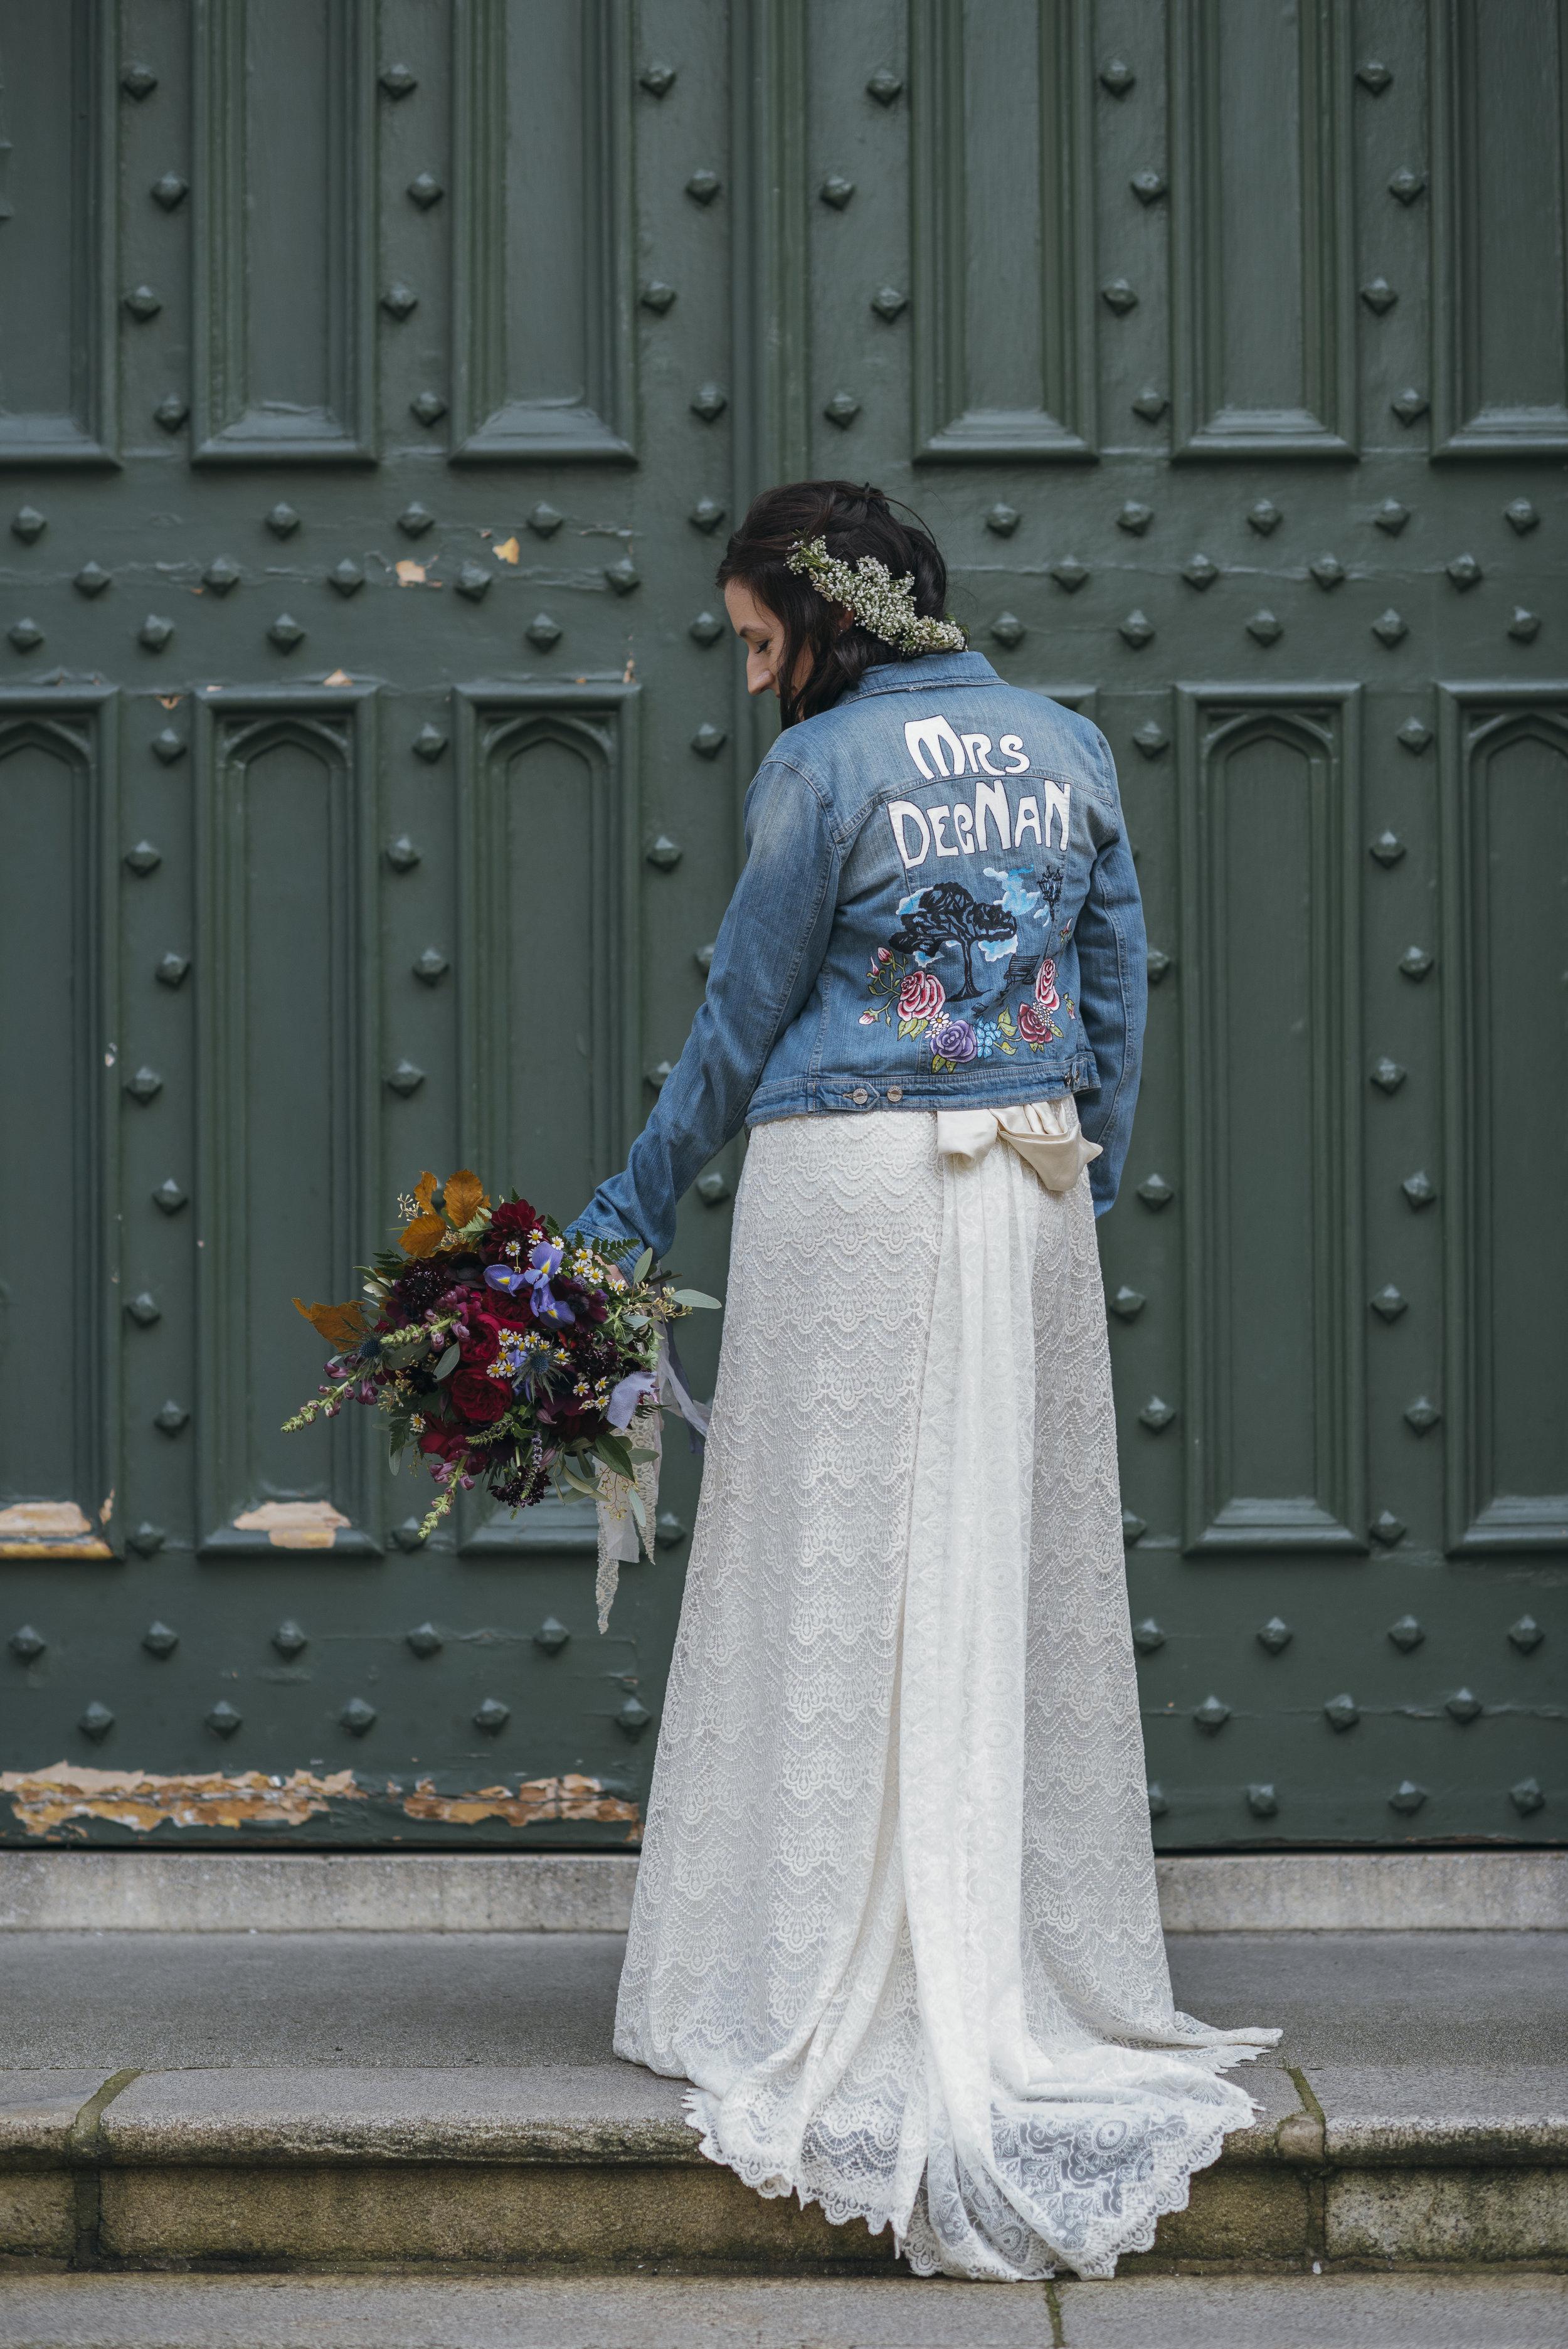 Steph wears Charley by Minna Hepburn